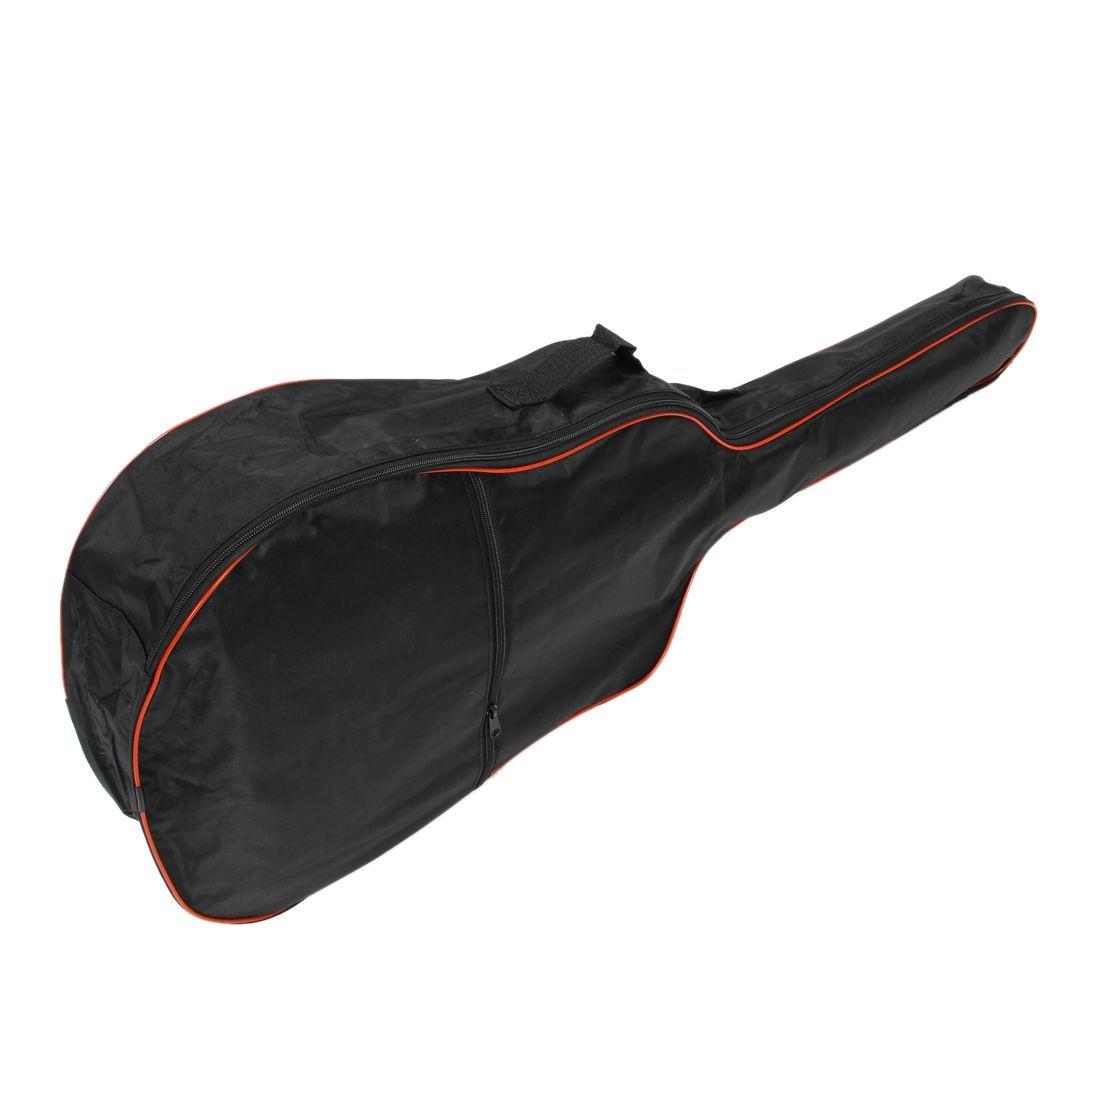 41 Inch Classical Acoustic Guitar Back Carry Bag 5mm Shoulder Straps